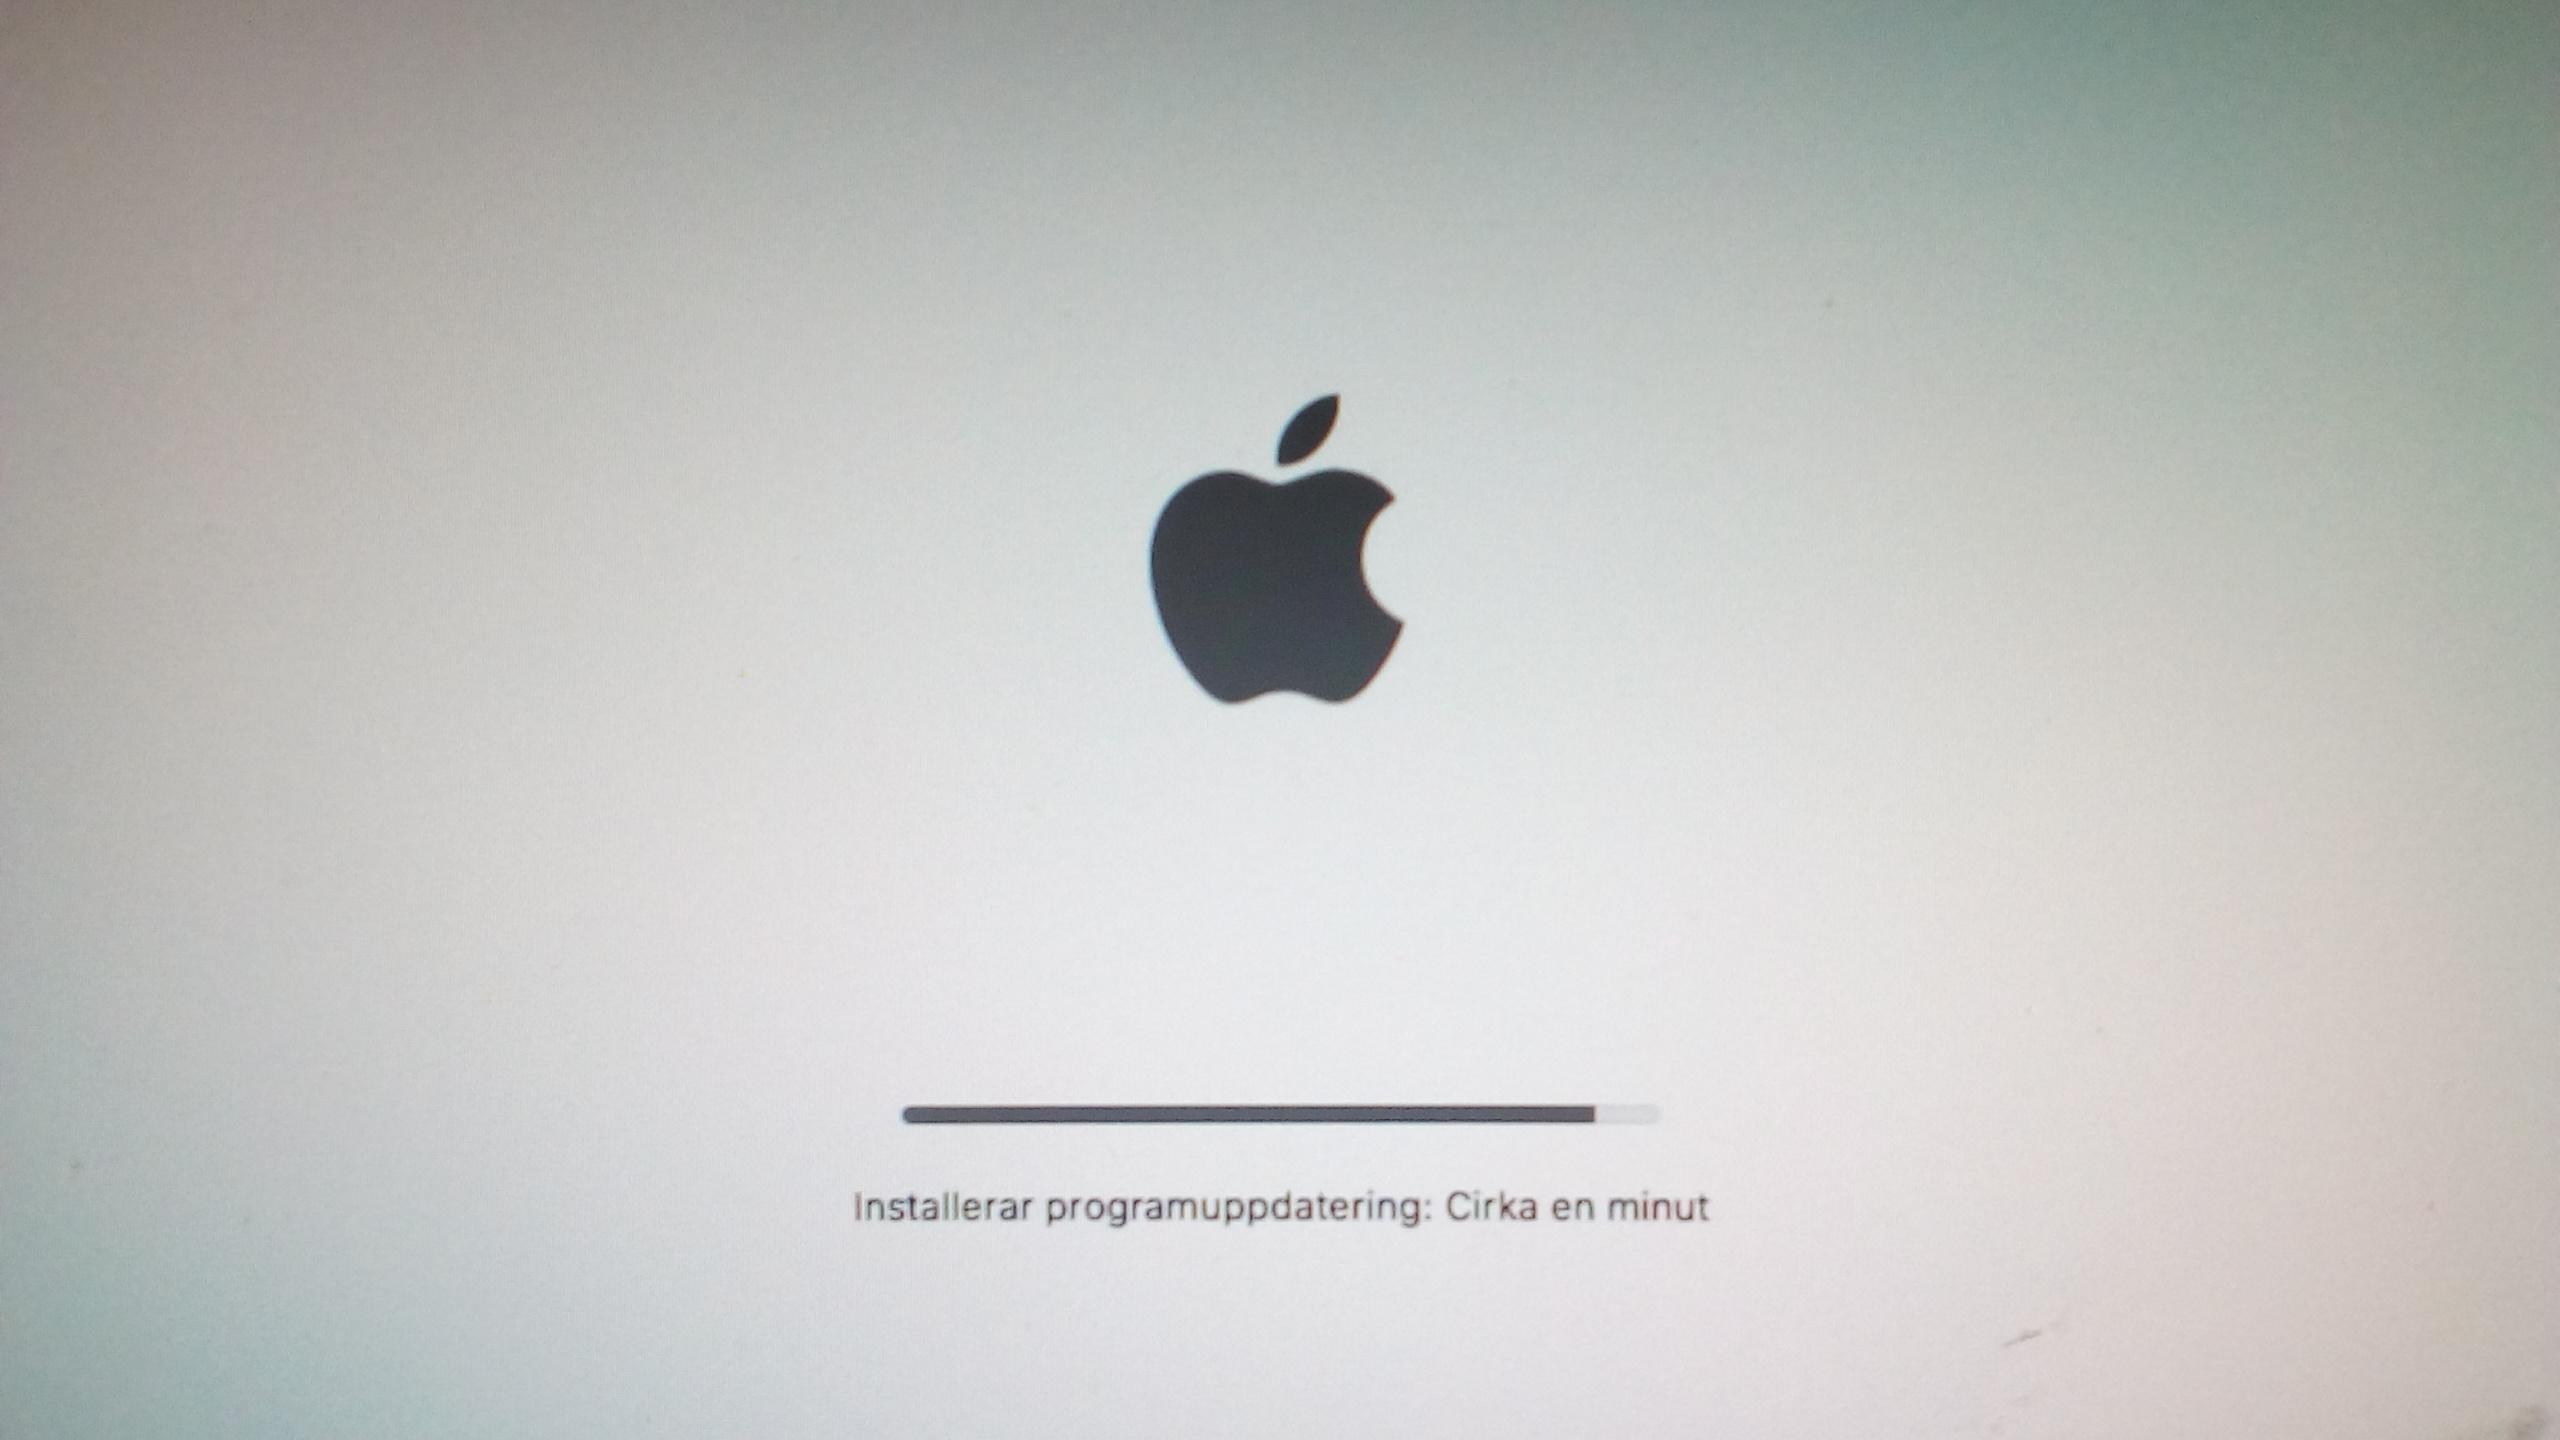 Mac freezes when updating software